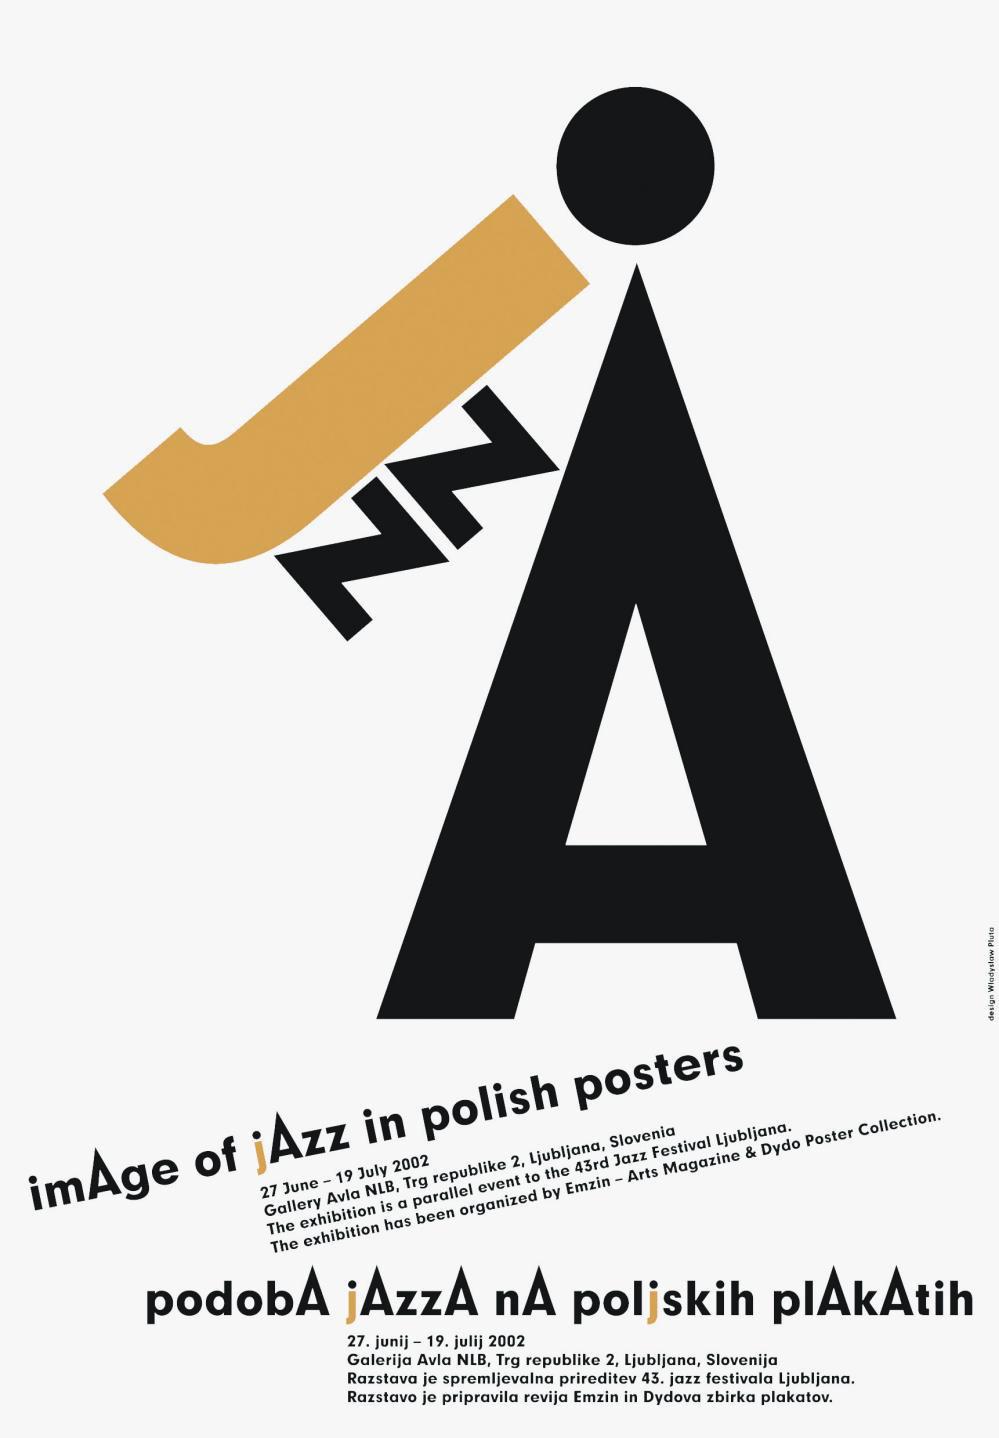 Wladyslaw-Pluta-affiche-jazz